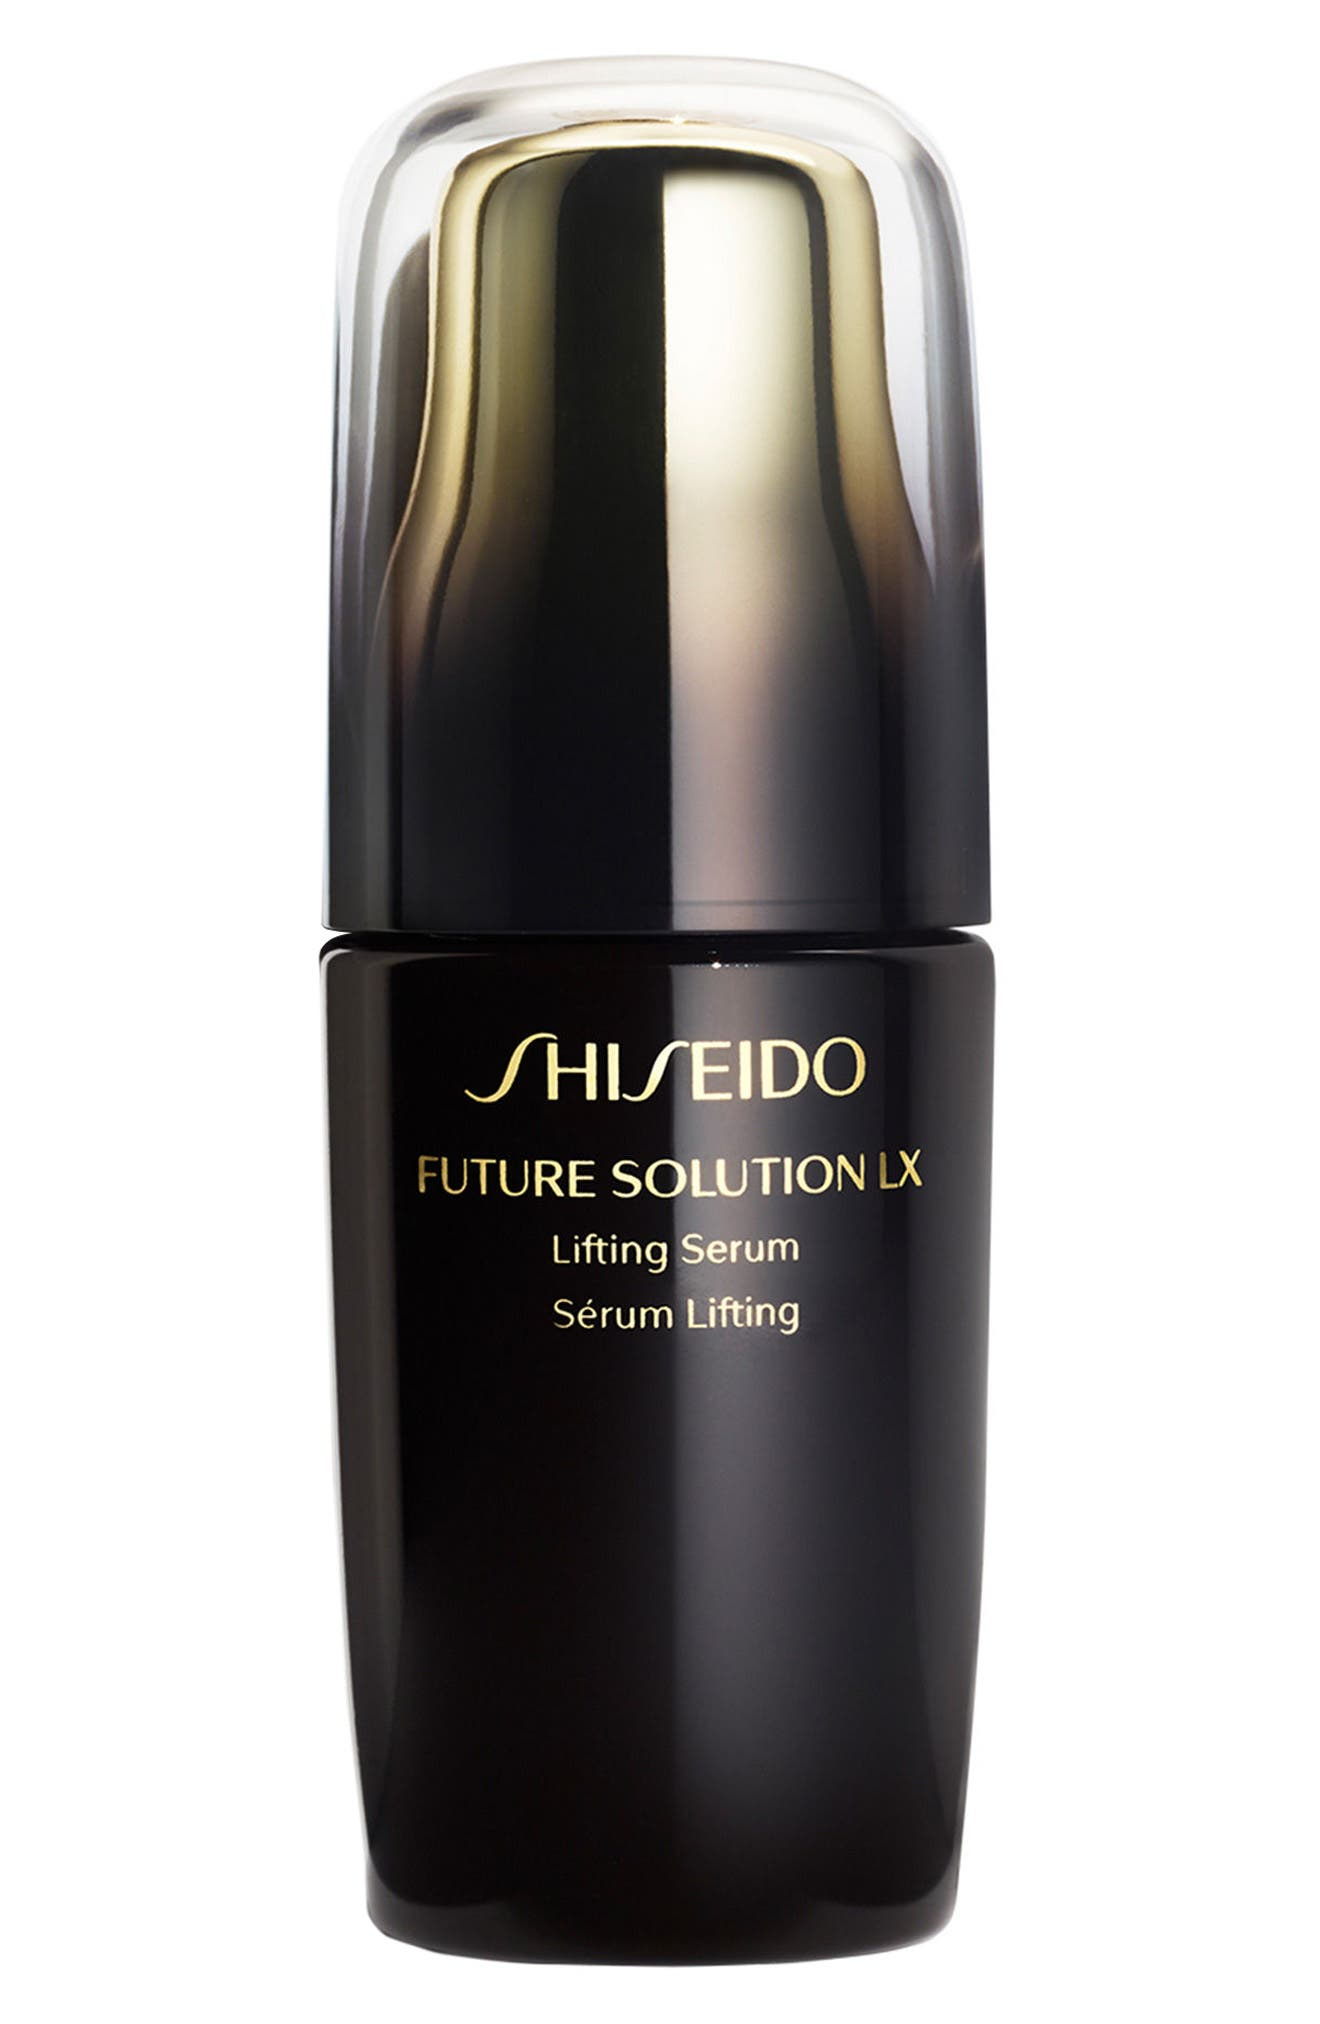 Shiseido Future Solution LX Intensive Firming Serum